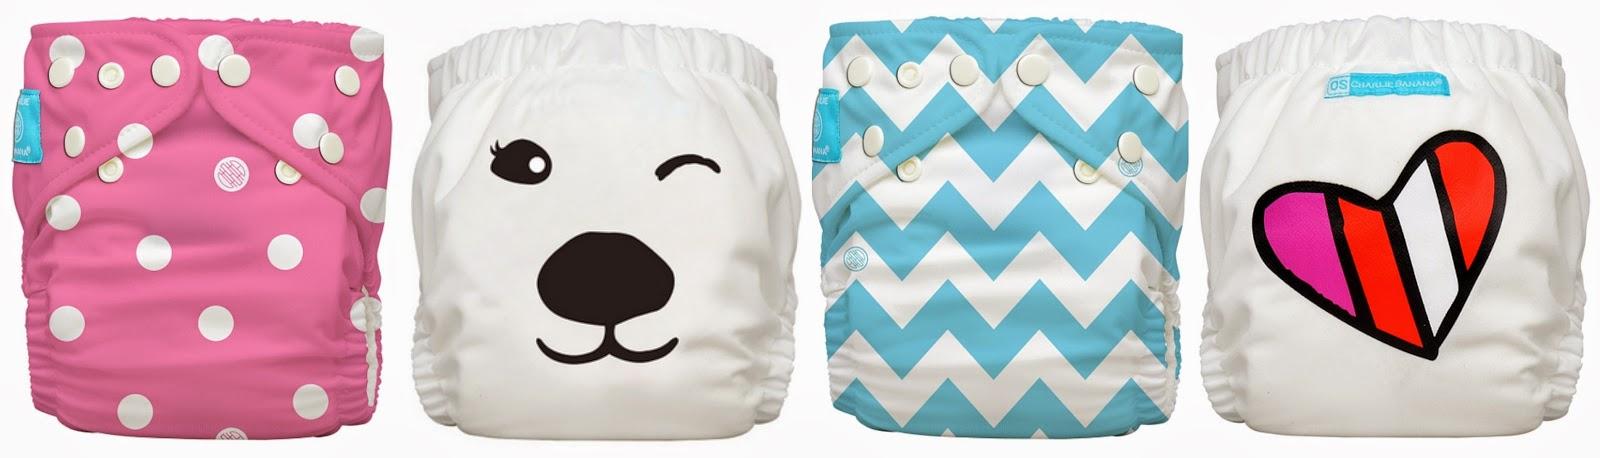 http://www.charliebanana.com/Best-One-Size-diapers_c_73.html